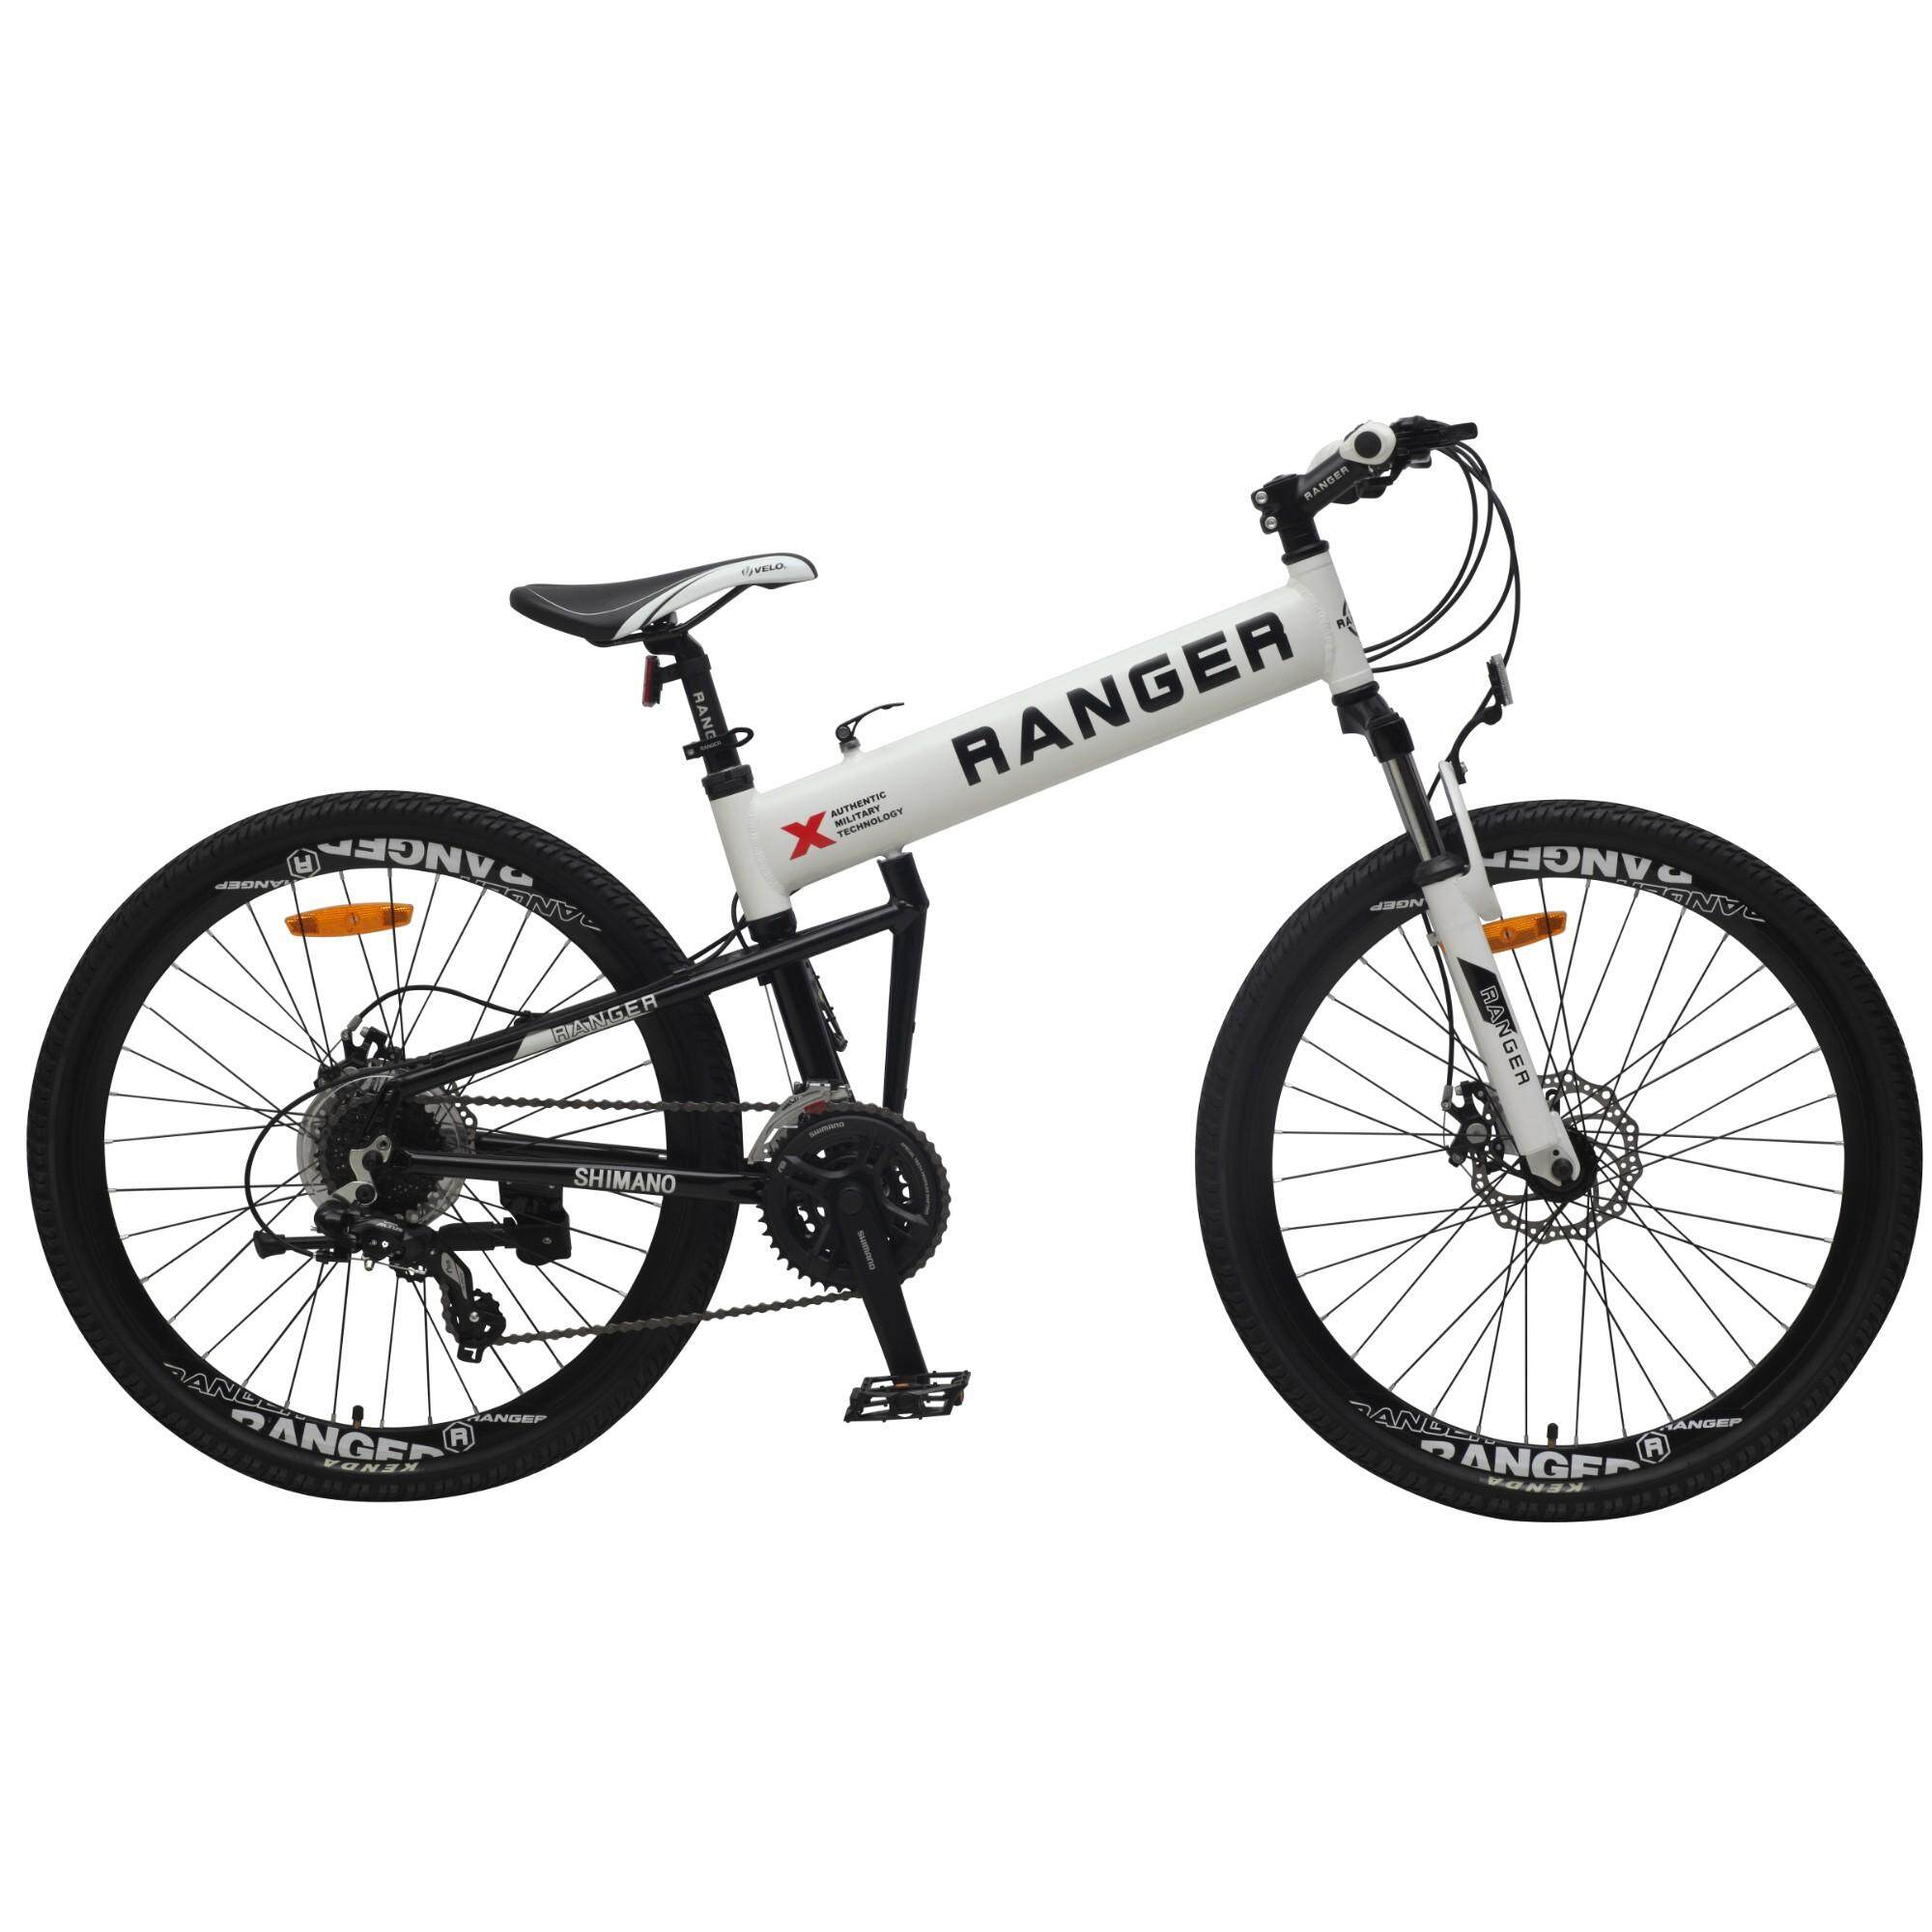 Ranger Foldable Mountain Bike